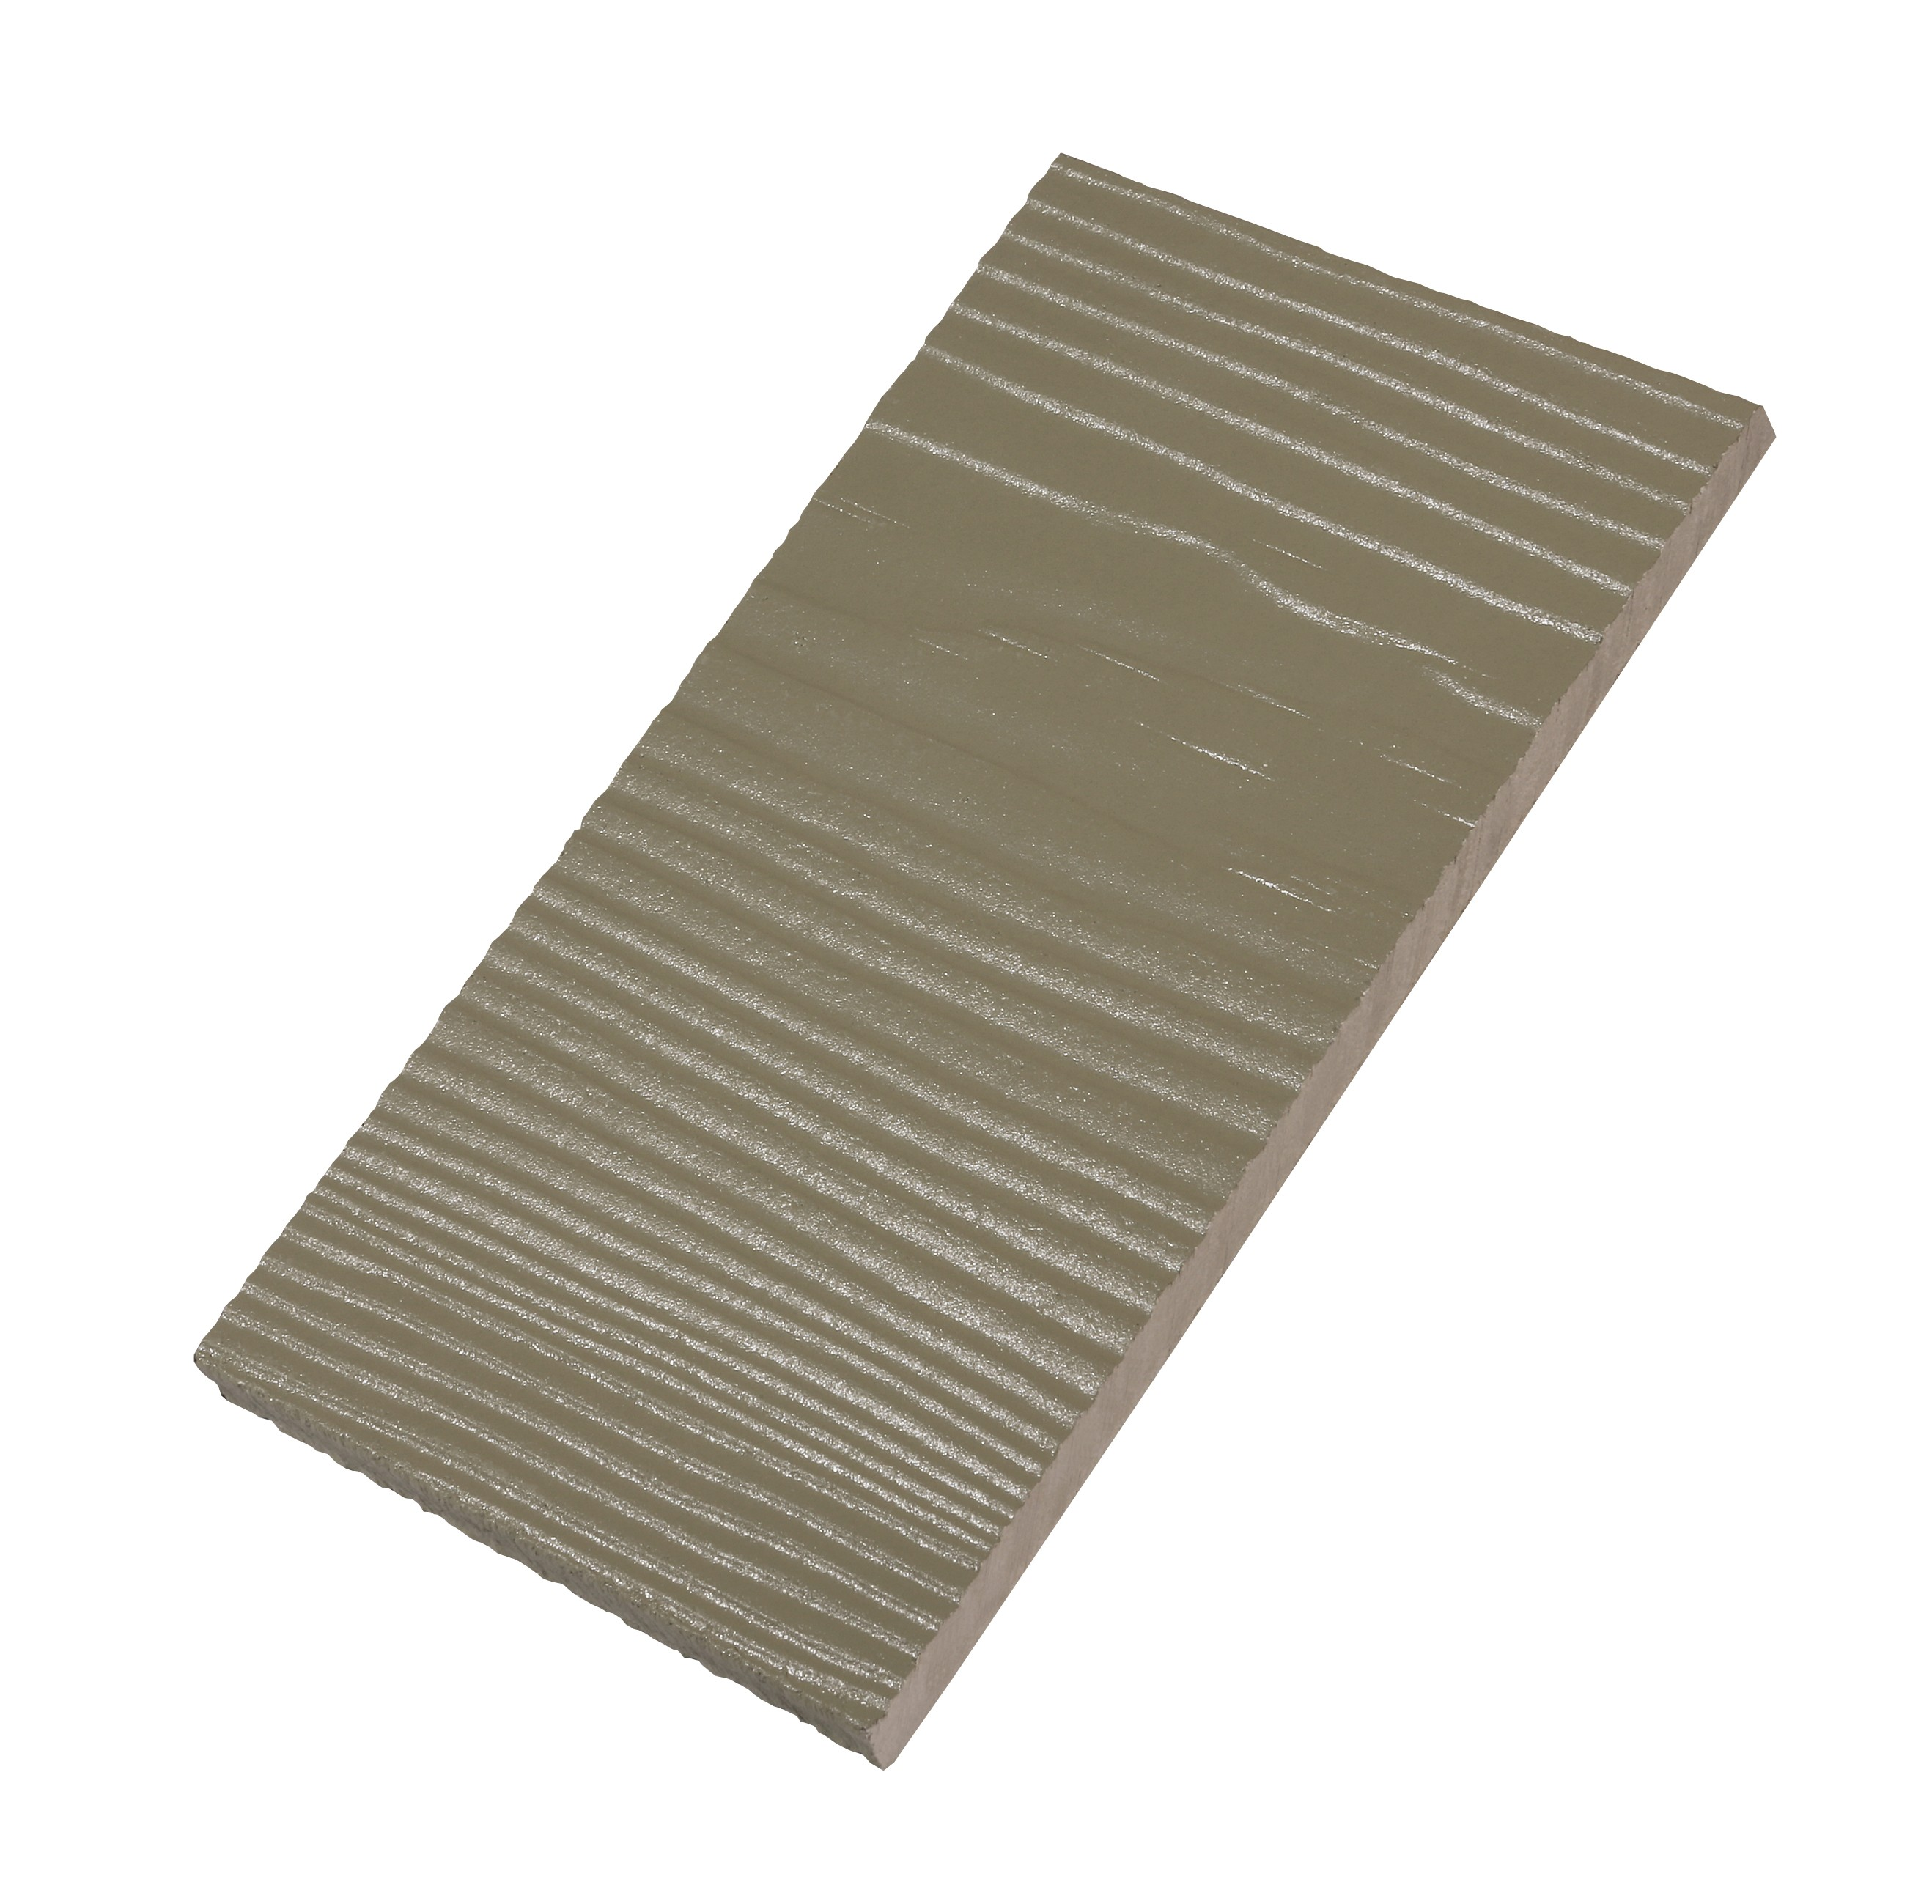 Cedral Lap Weatherboard Cladding - Sage Green